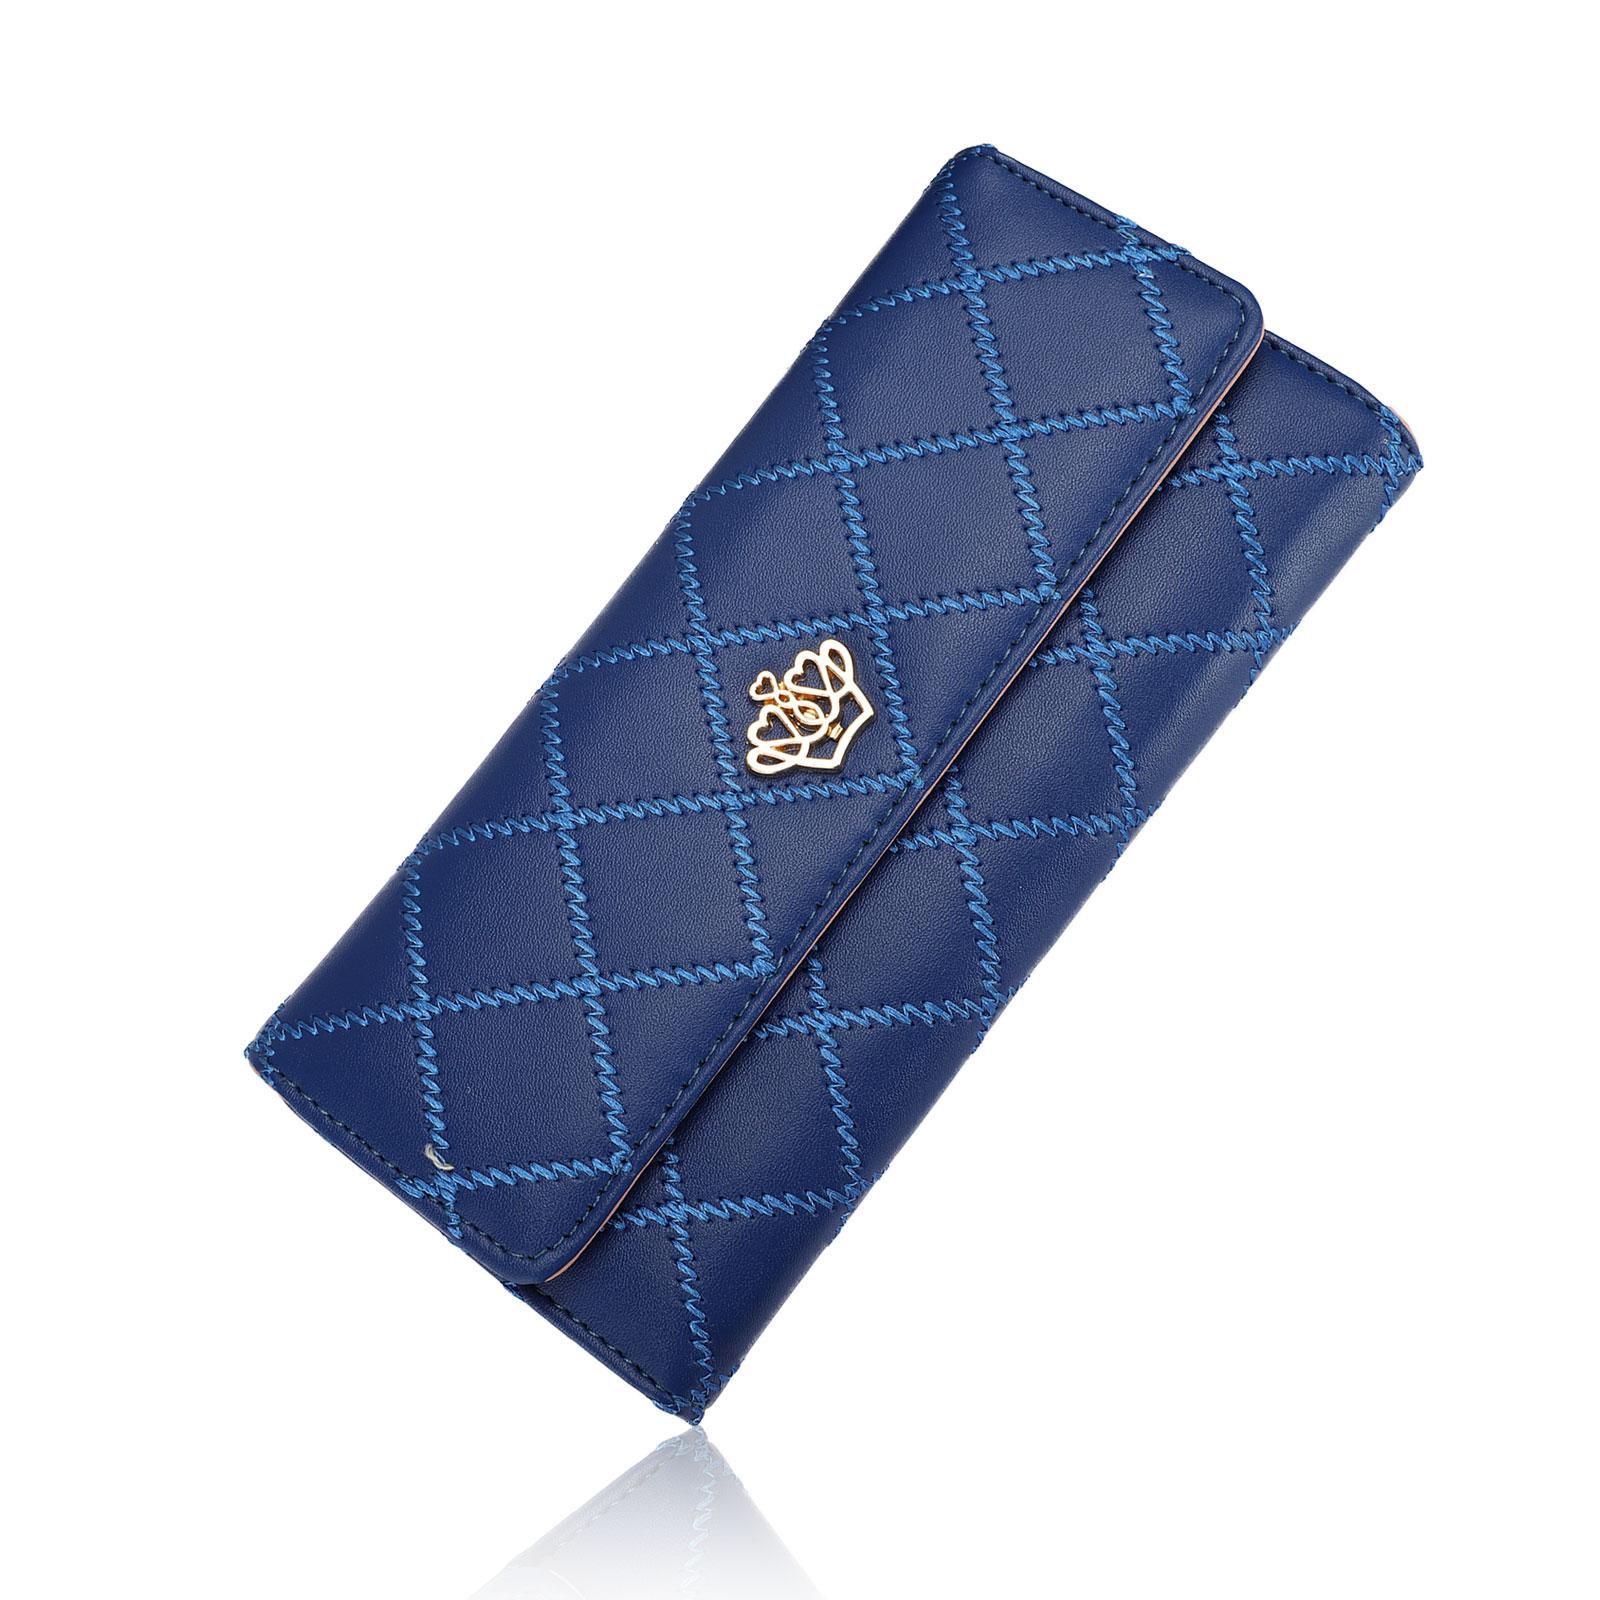 Women-Fashion-Bifold-Wallet-Leather-Clutch-Card-Holder-Purse-Lady-Long-Handbag thumbnail 10